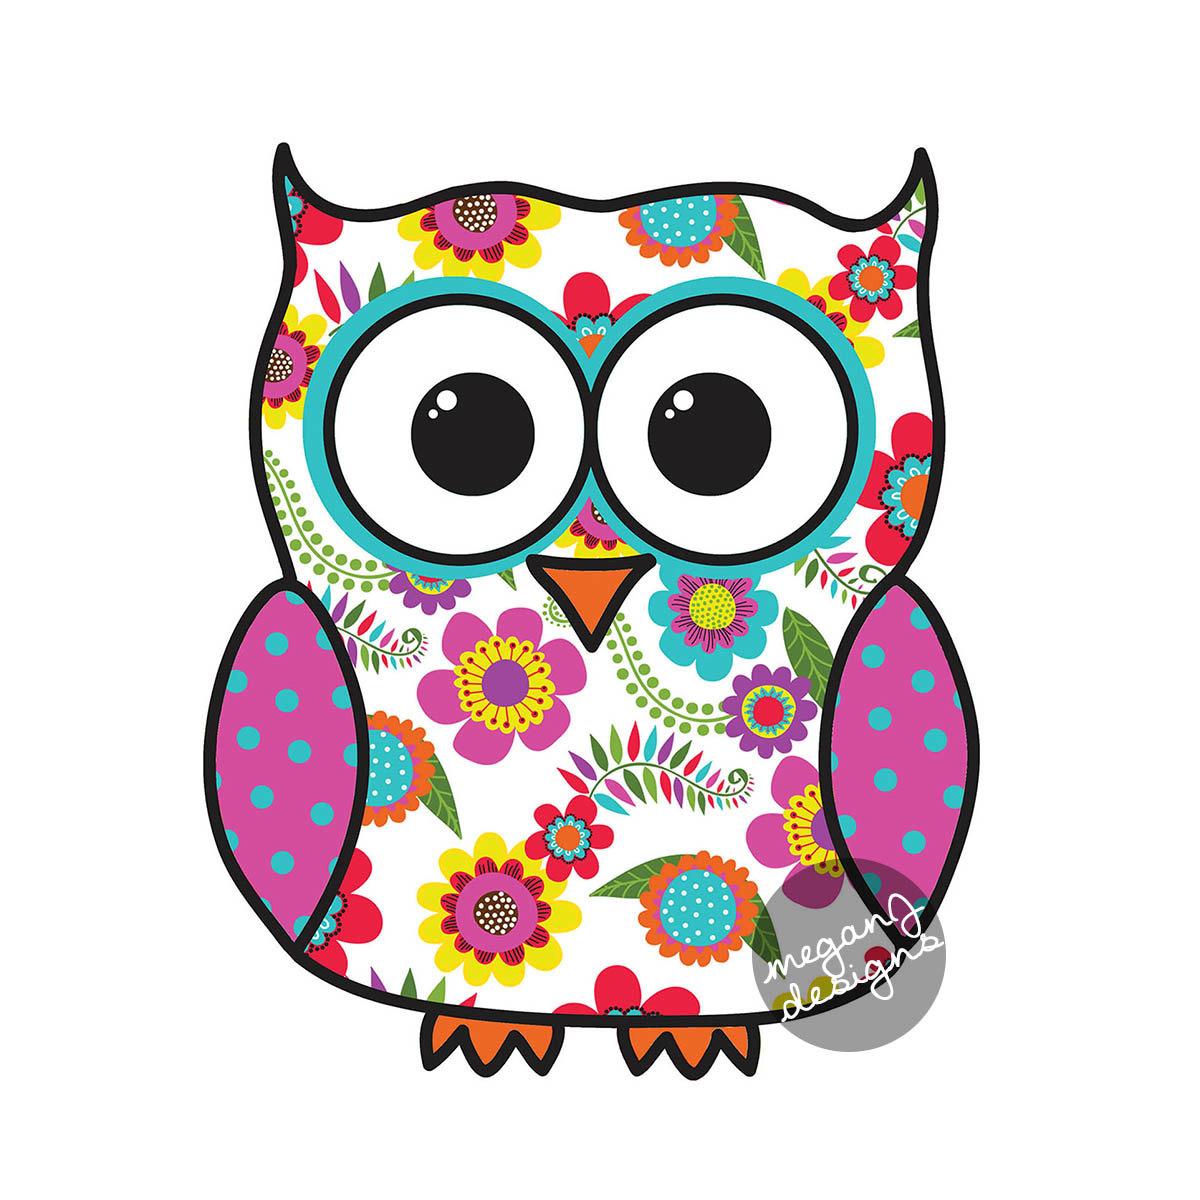 1200x1200 Colorful Floral Owl Car Decal Sticker Cute Owl Bumper Sticker